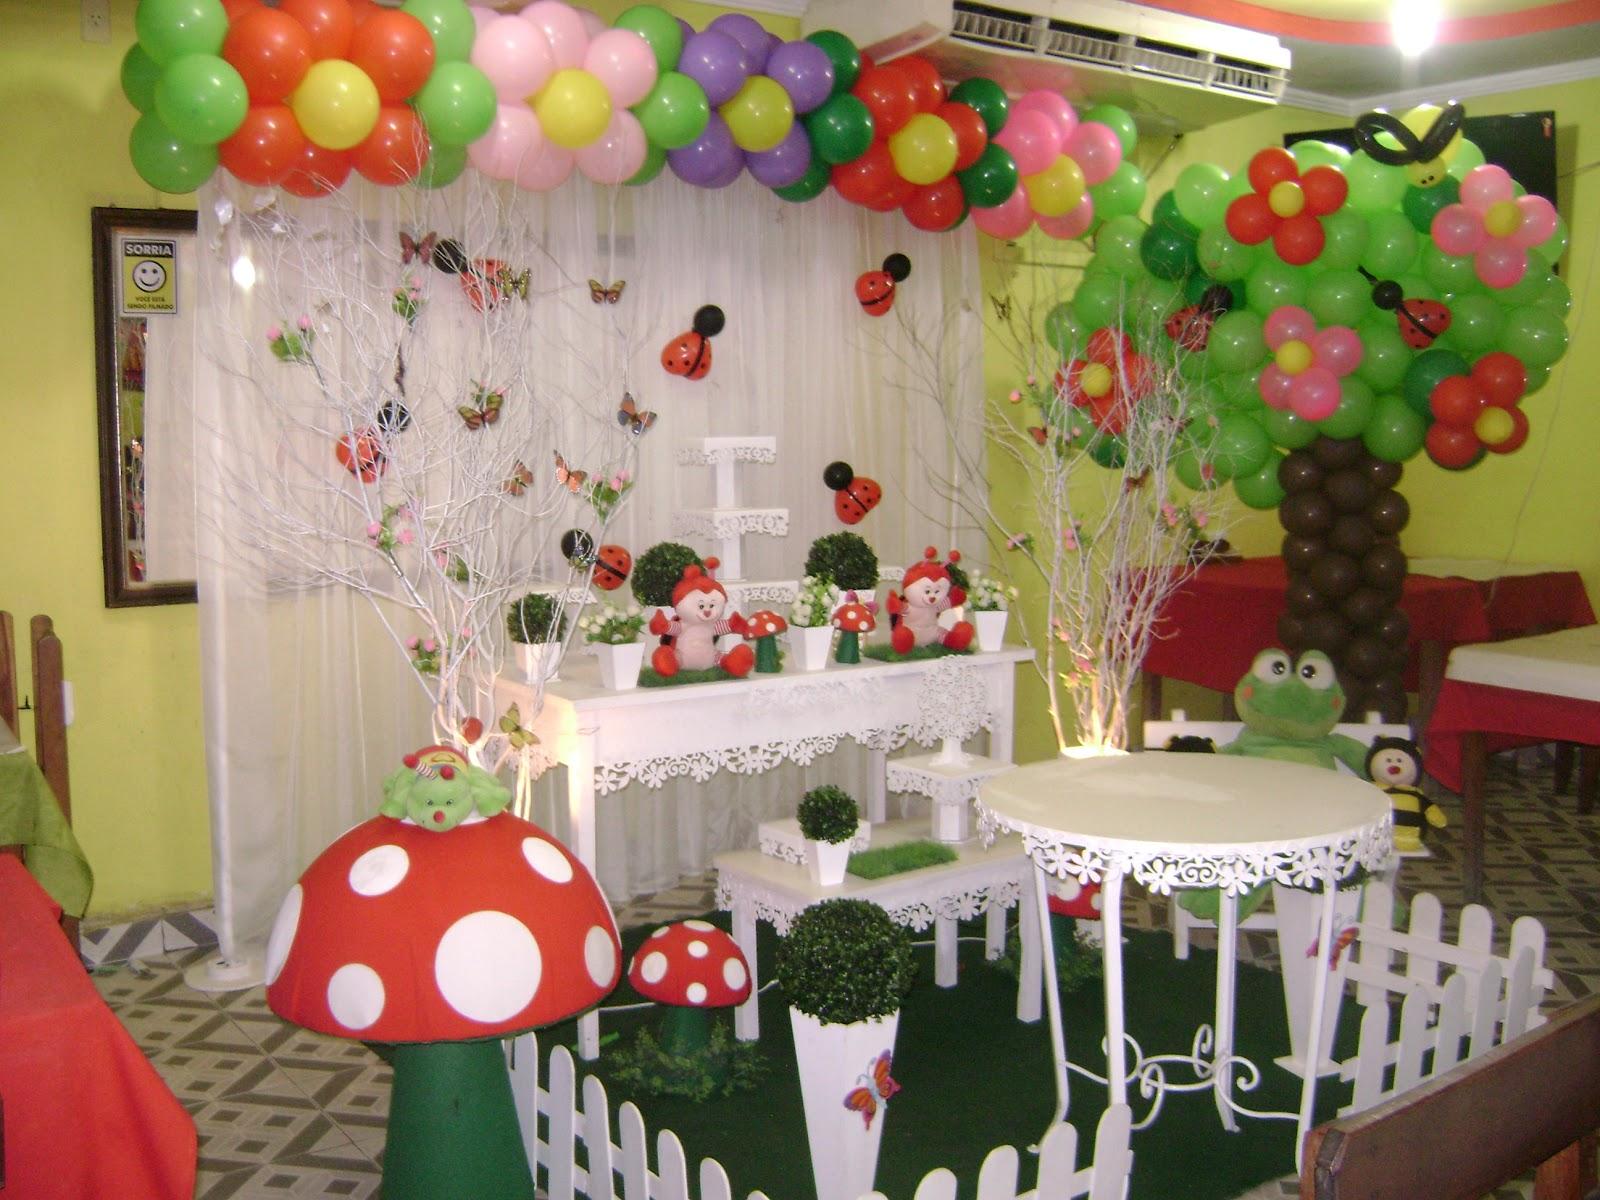 festa tema jardim provencal:Miragem Festas Infantis: Festa Provençal Jardim